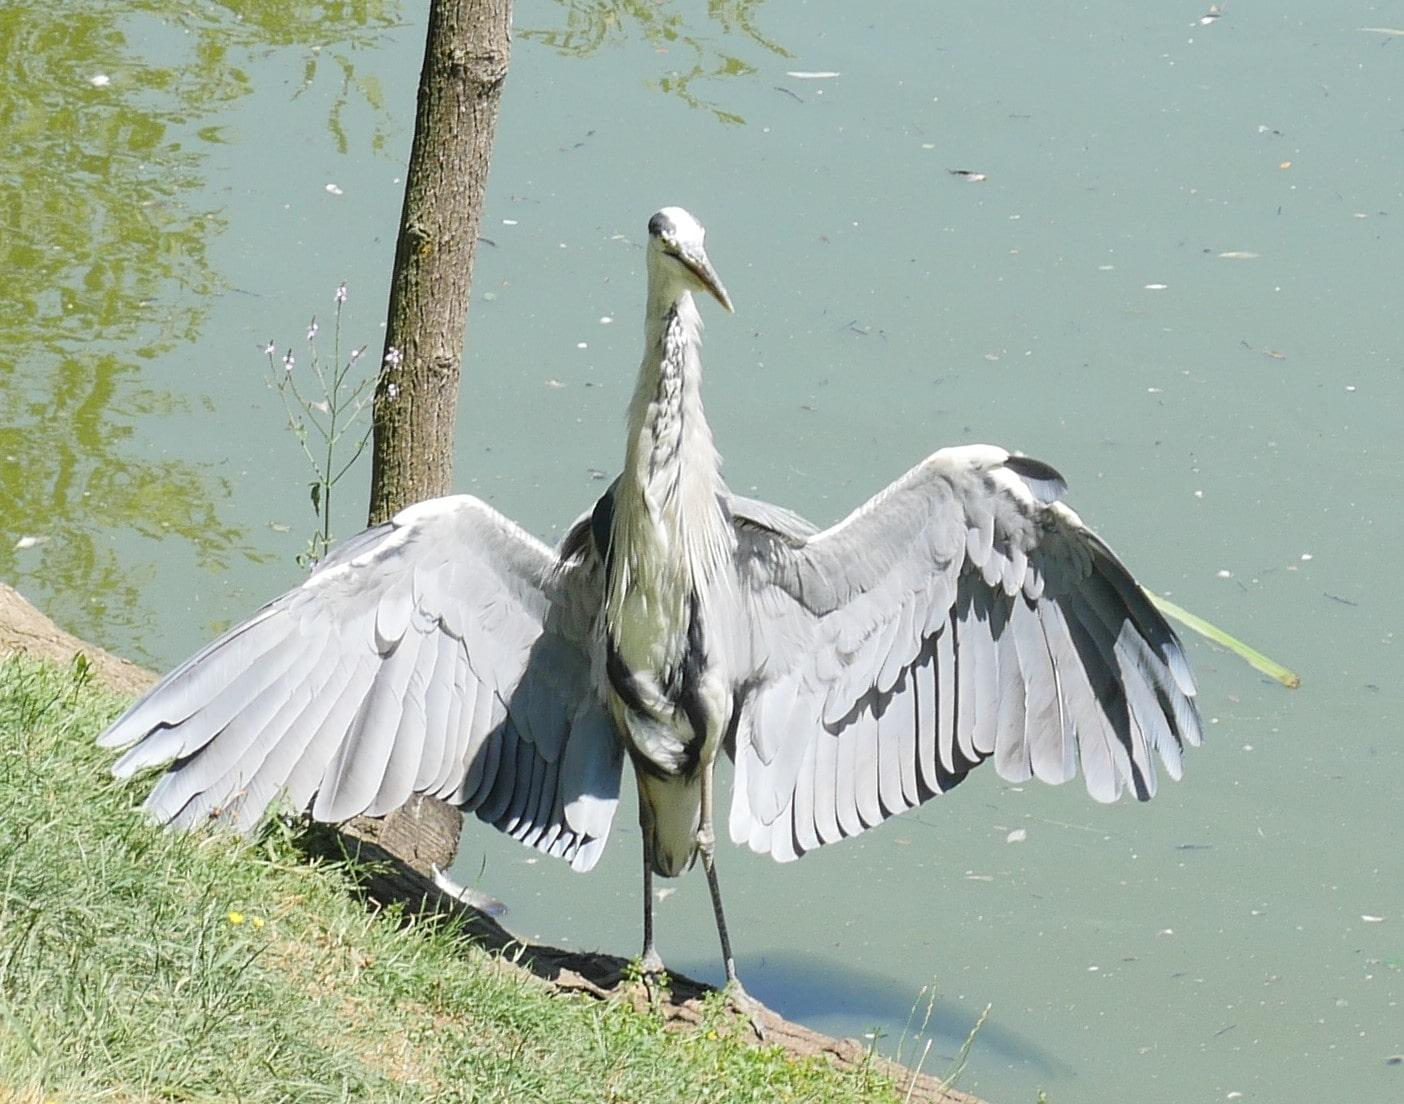 Oiseau exhibitionniste